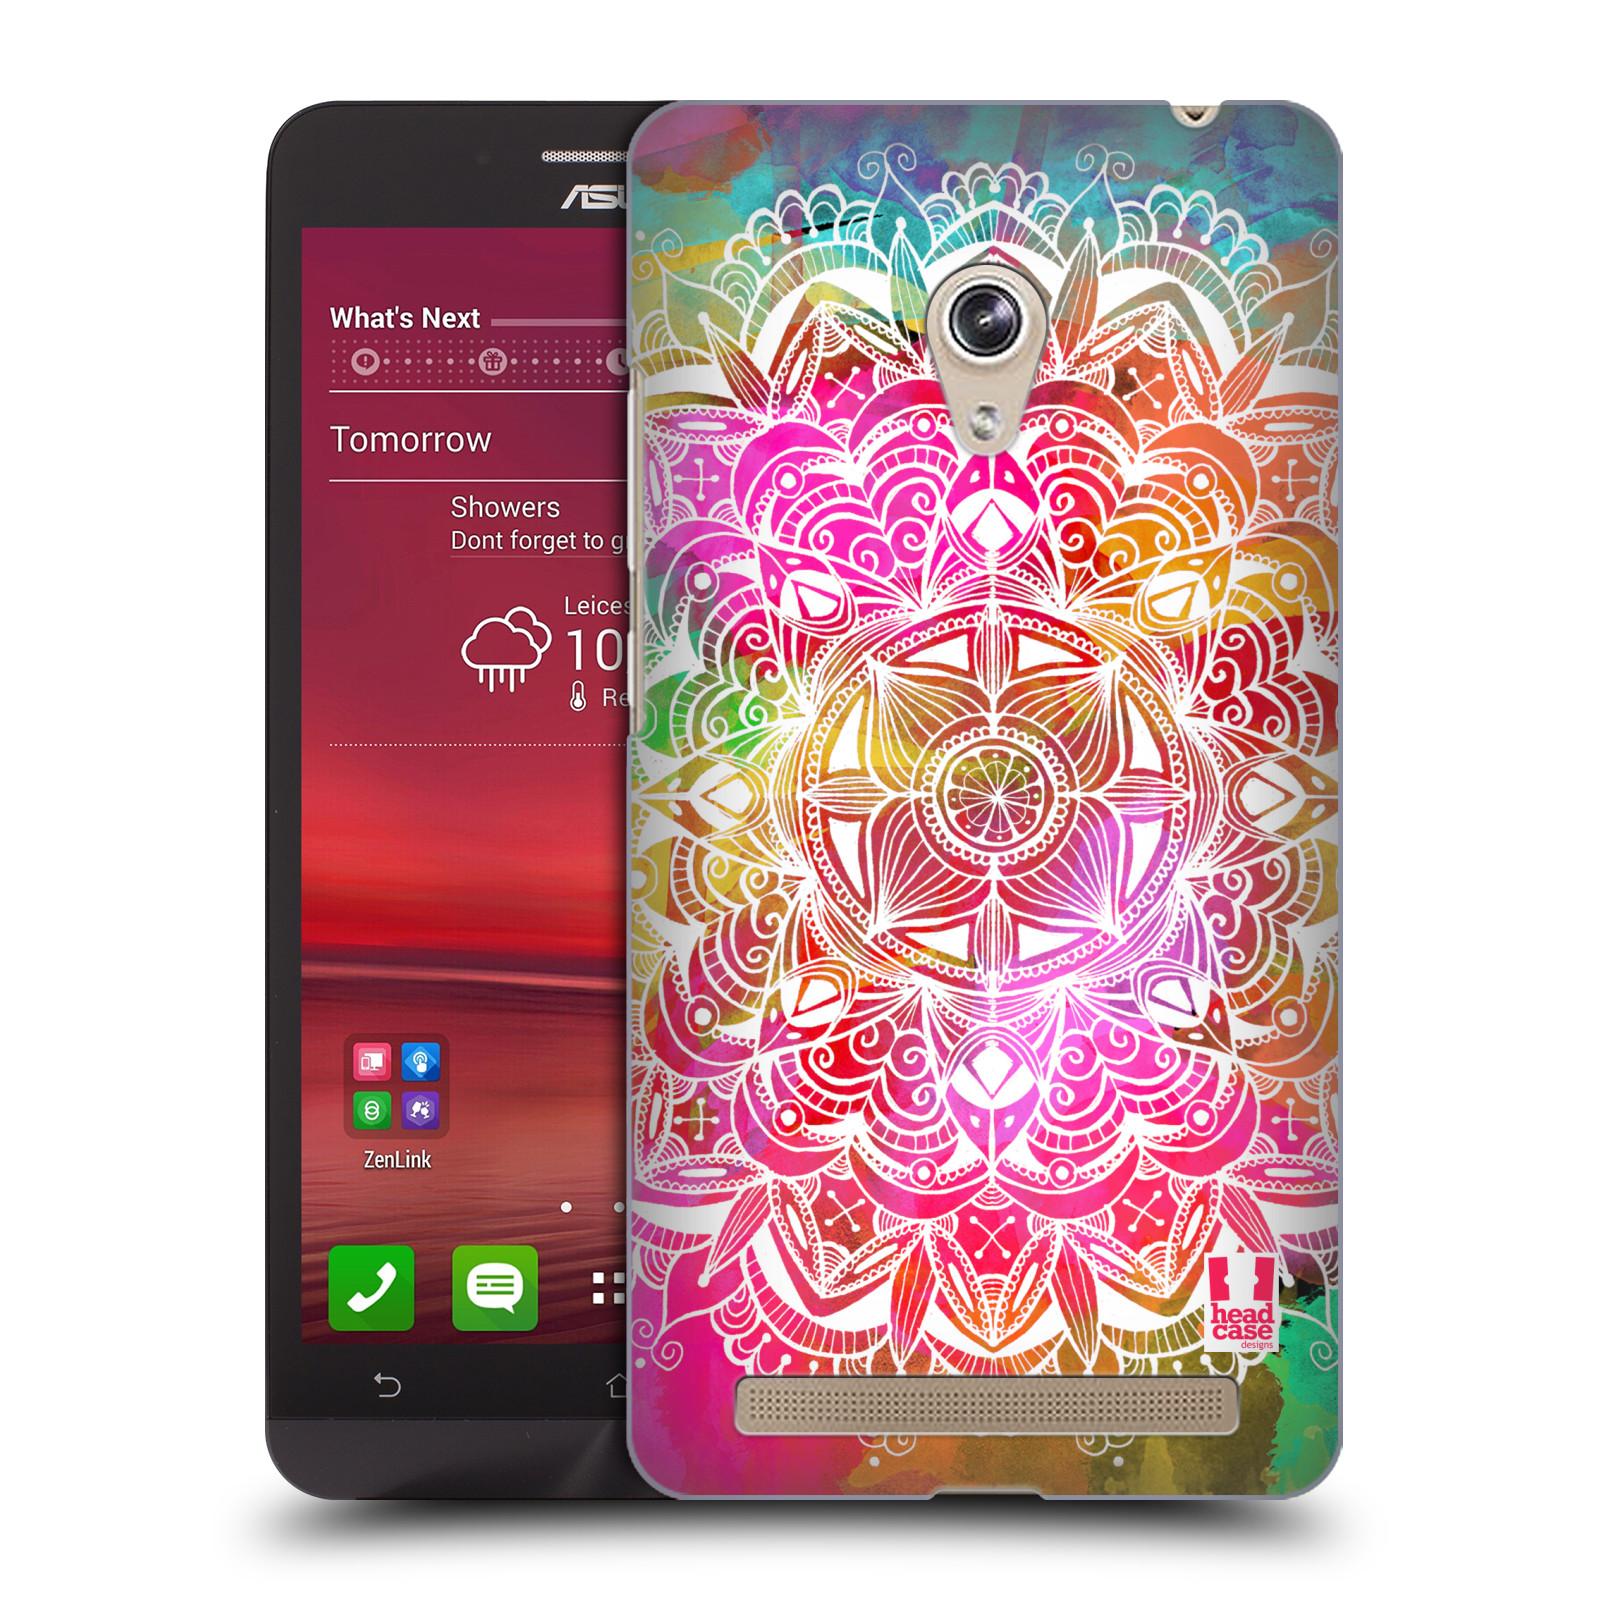 Plastové pouzdro na mobil Asus Zenfone 6 HEAD CASE Mandala Doodle Watercolour (Kryt či obal na mobilní telefon Asus Zenfone 6 A600CG / A601CG)